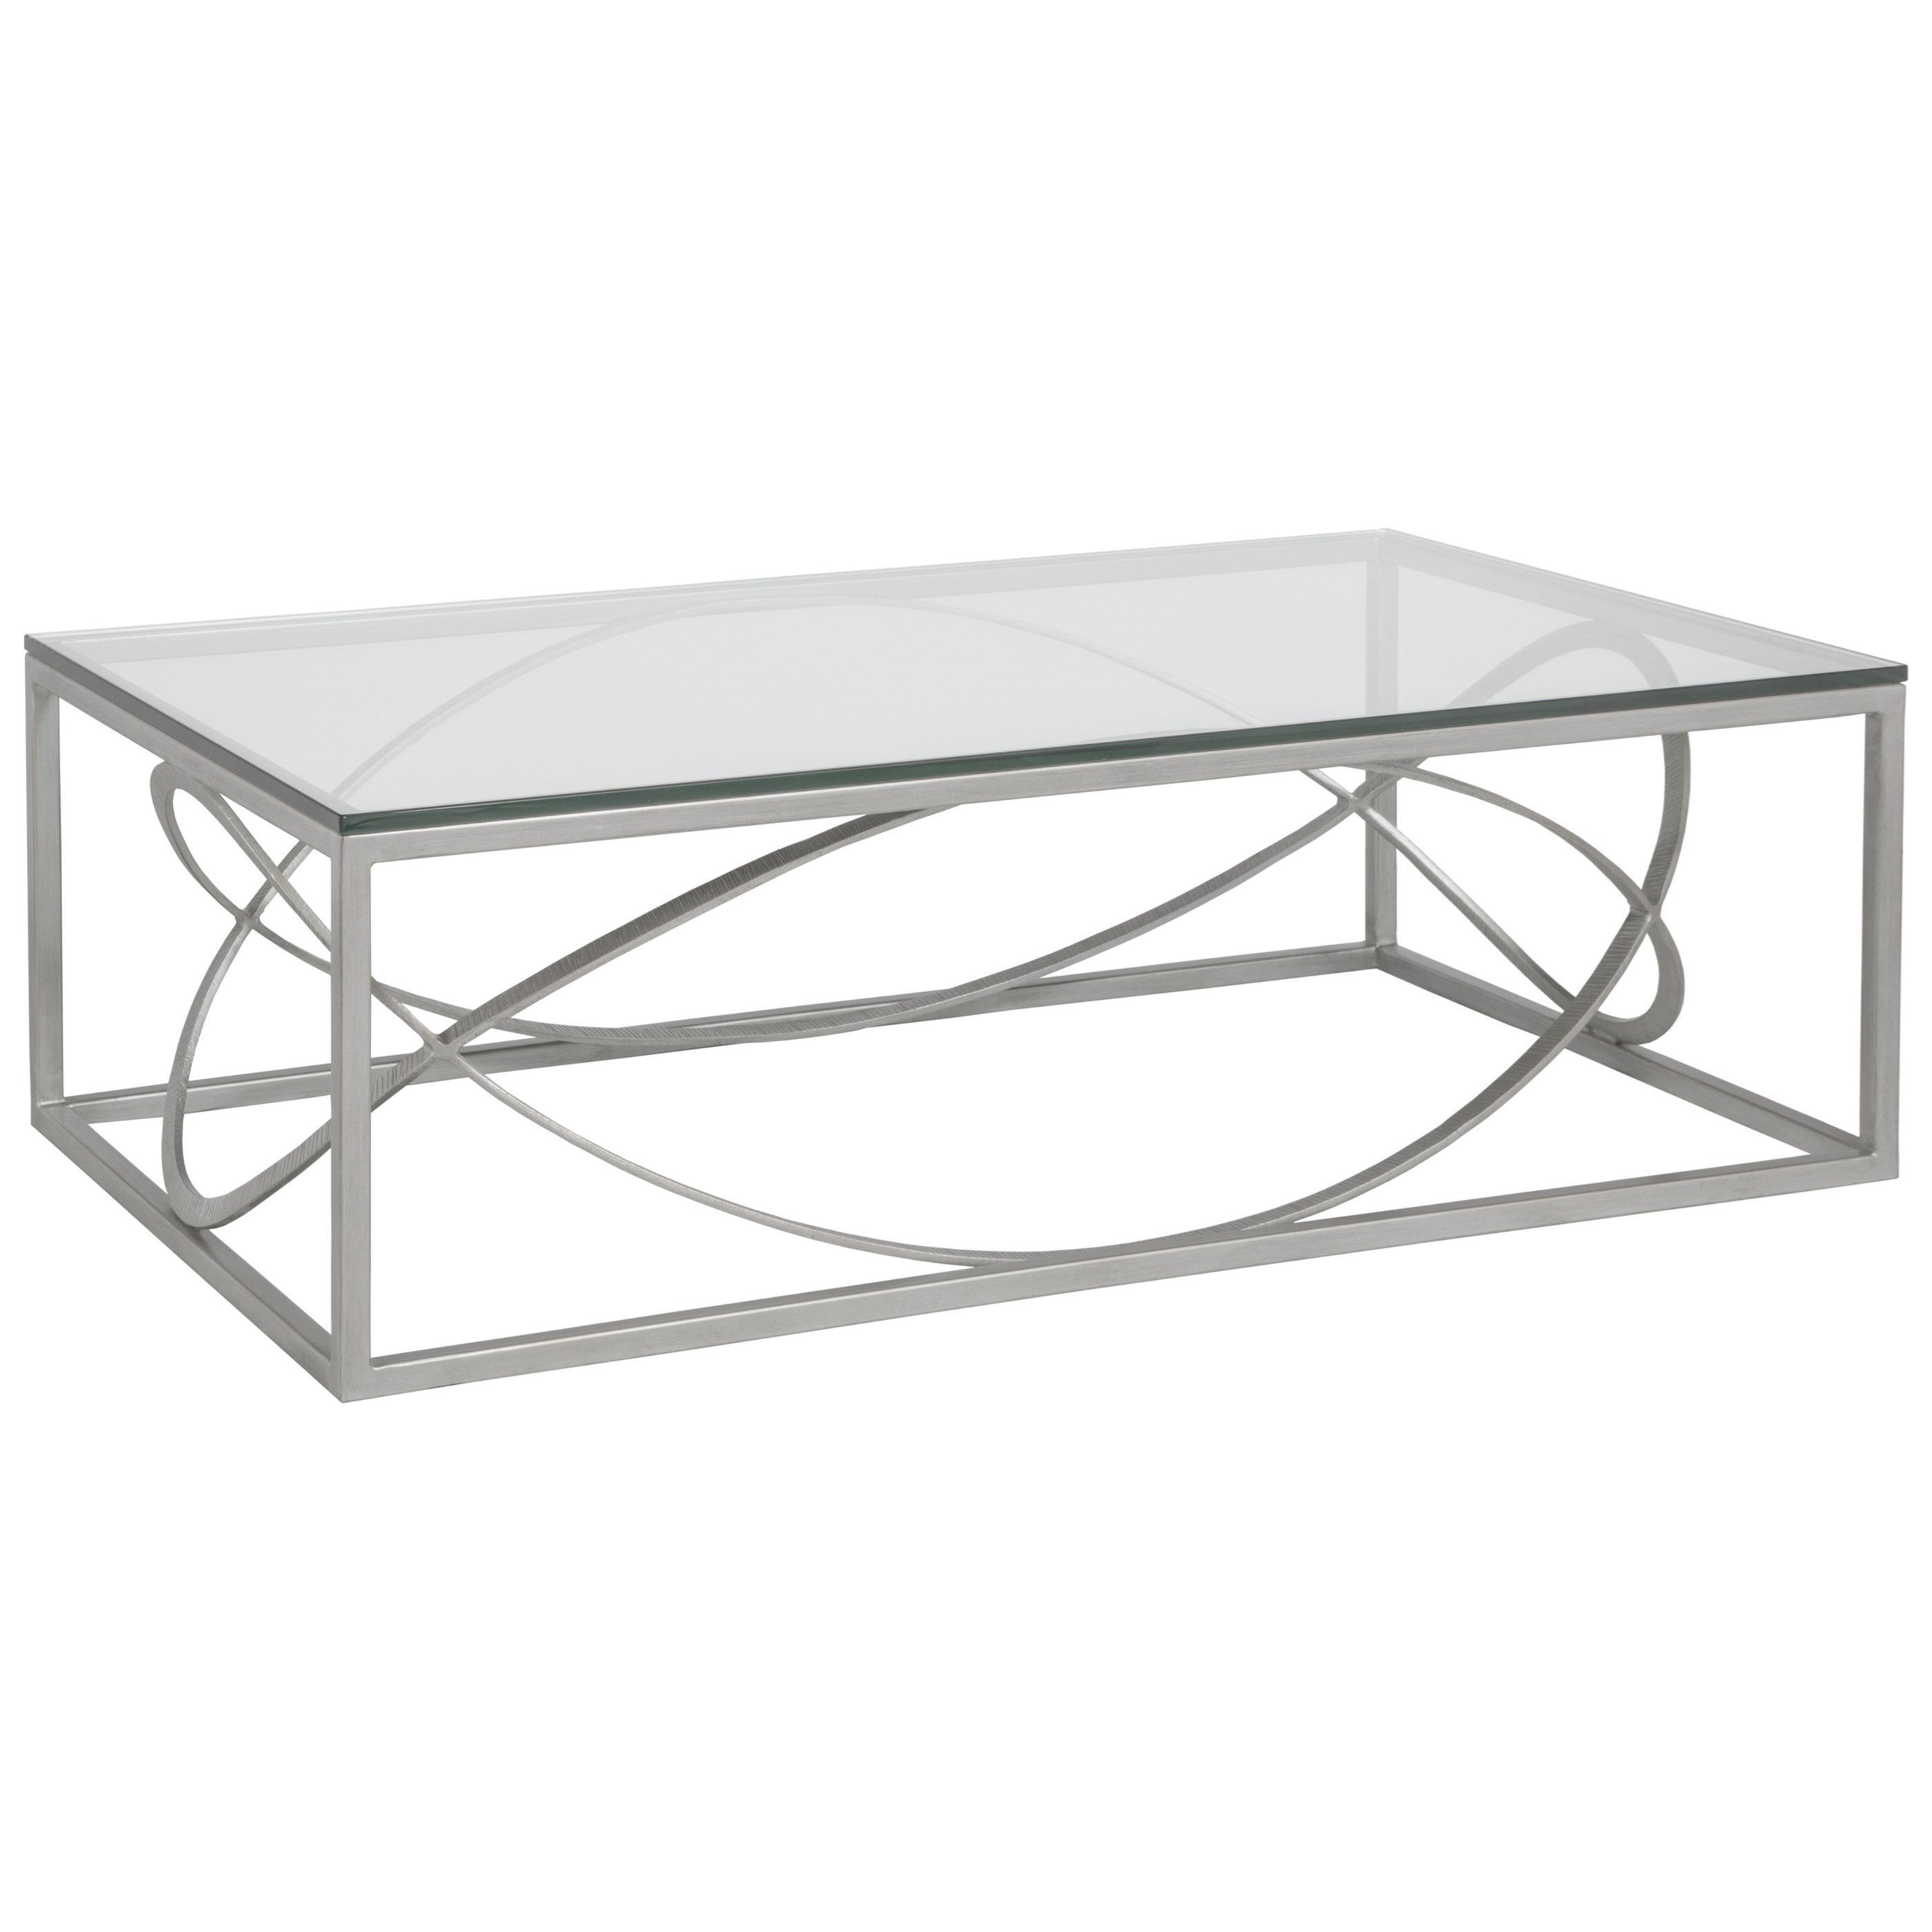 Metal Designs Ellipse Rectangular Cocktail Table by Artistica at Baer's Furniture